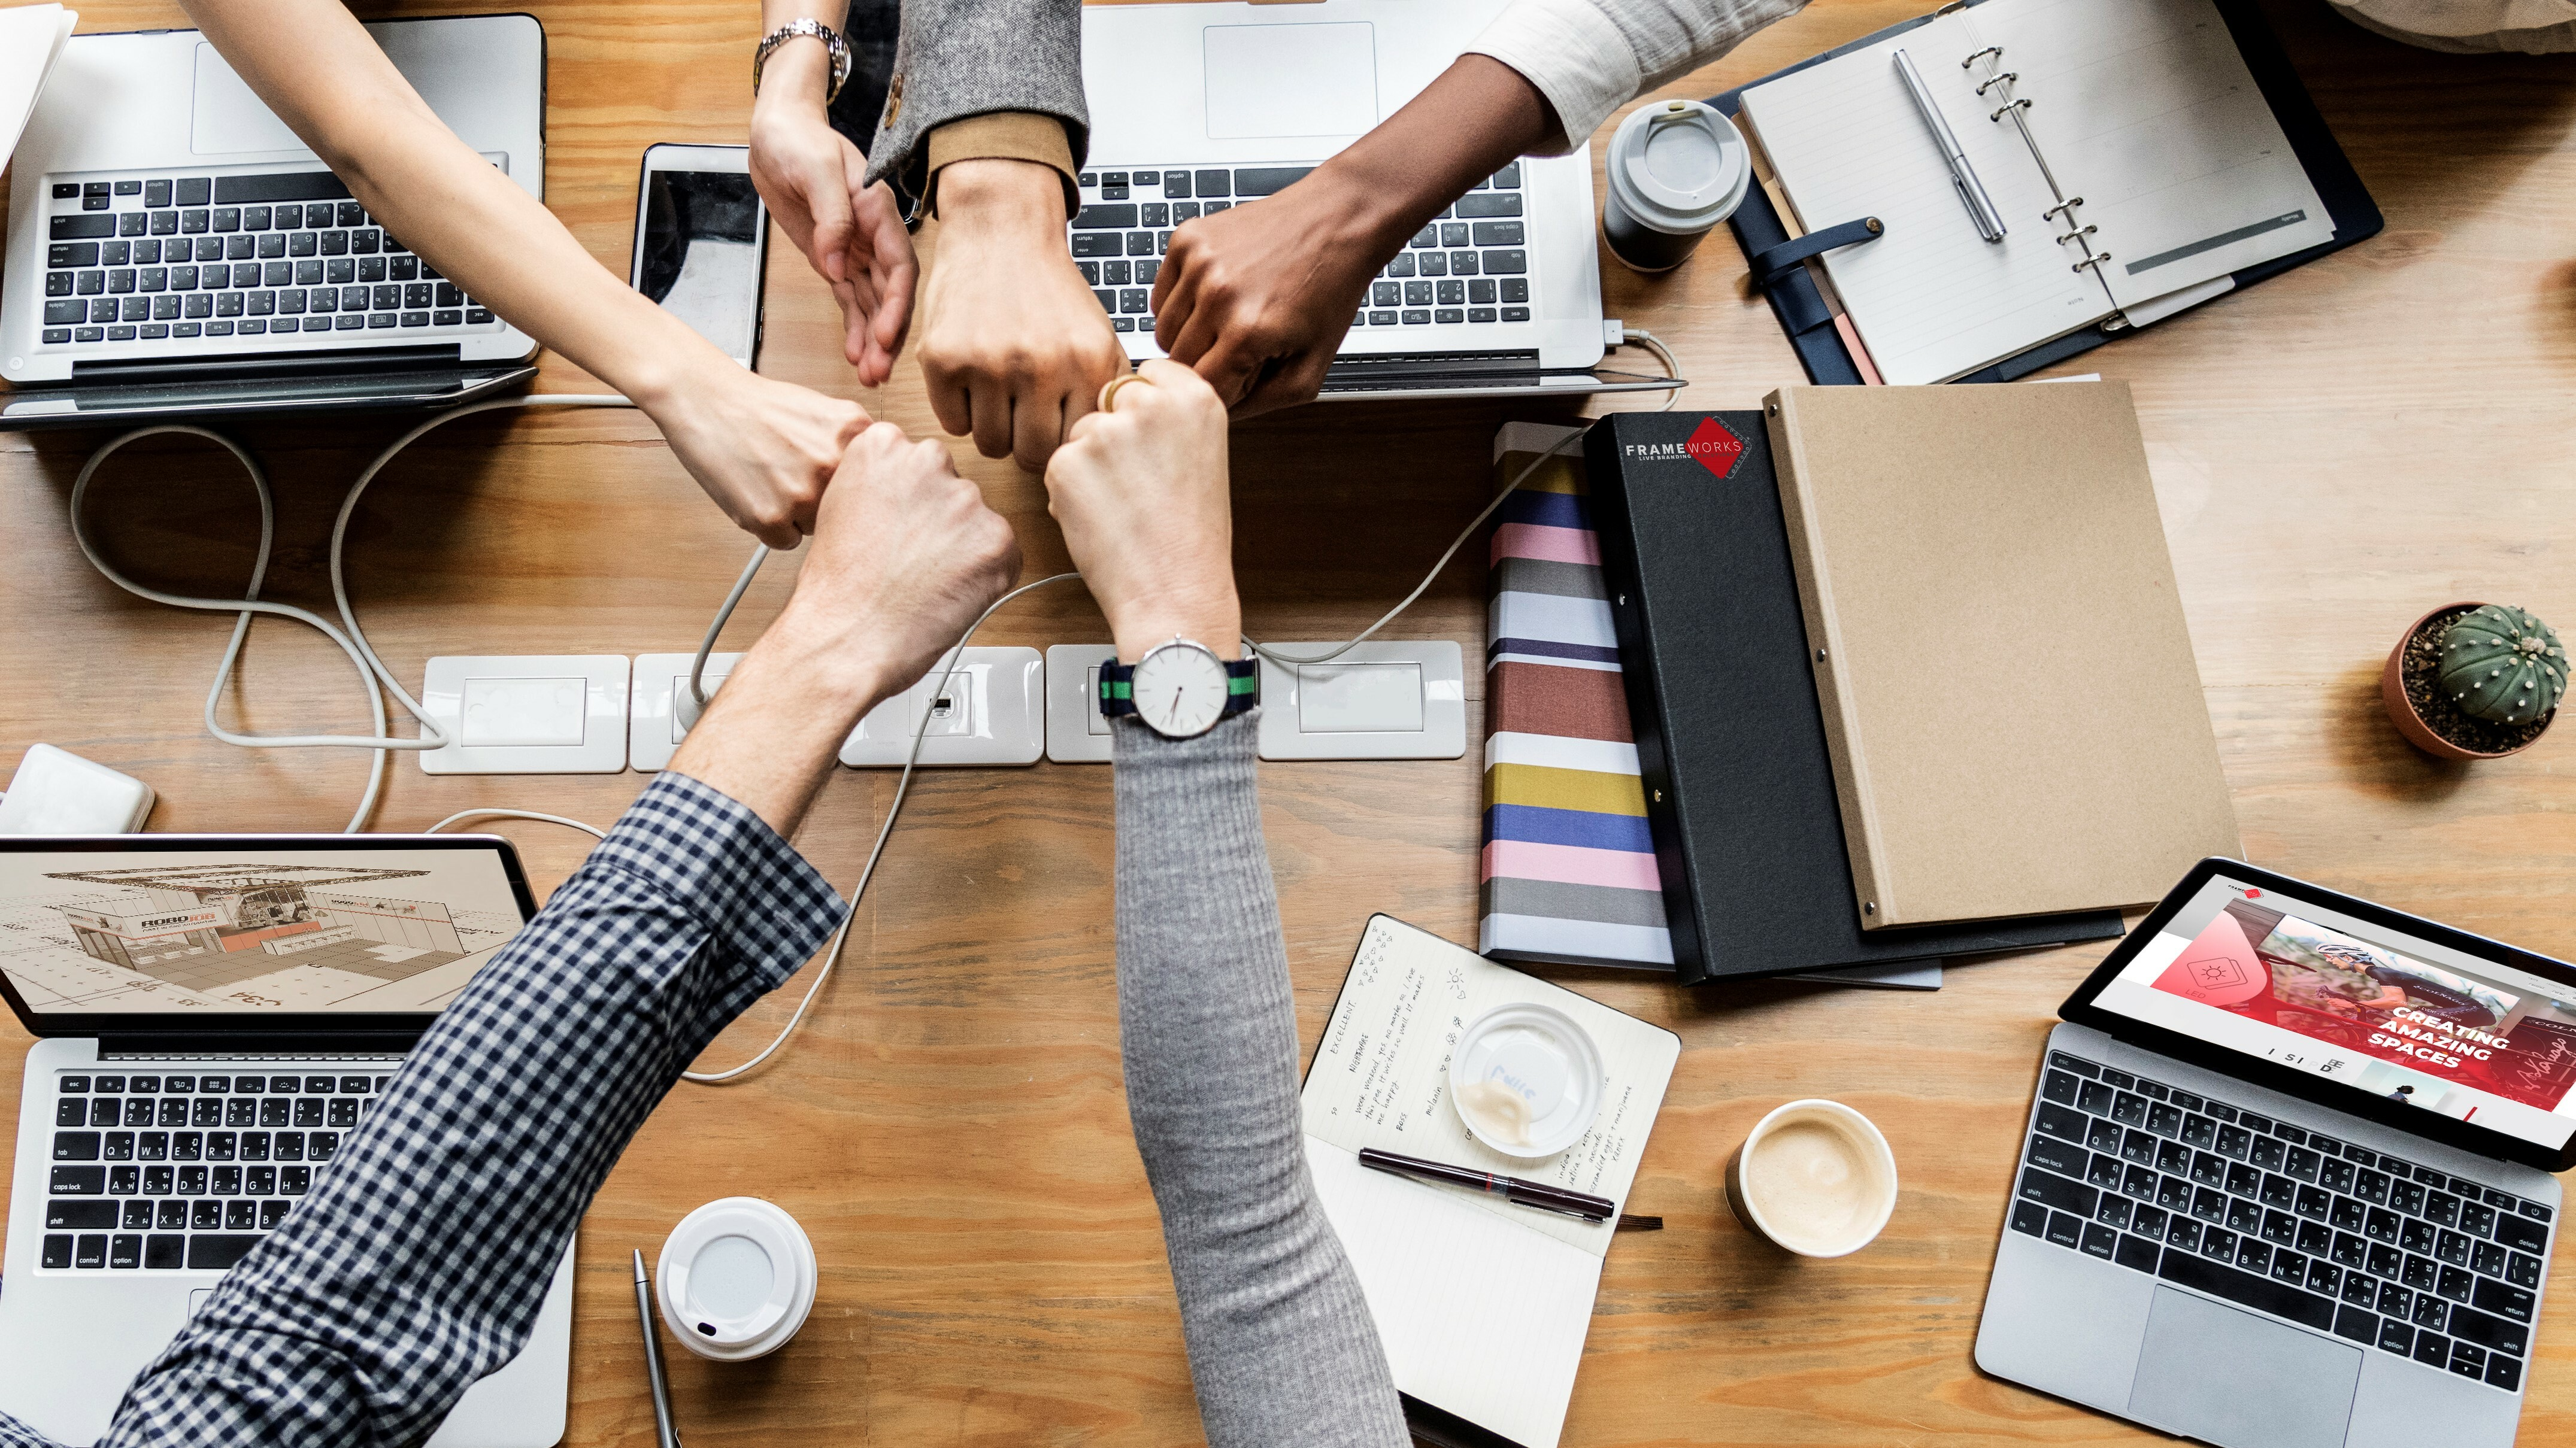 Teamwork Hands Frameworks Breedbeeld